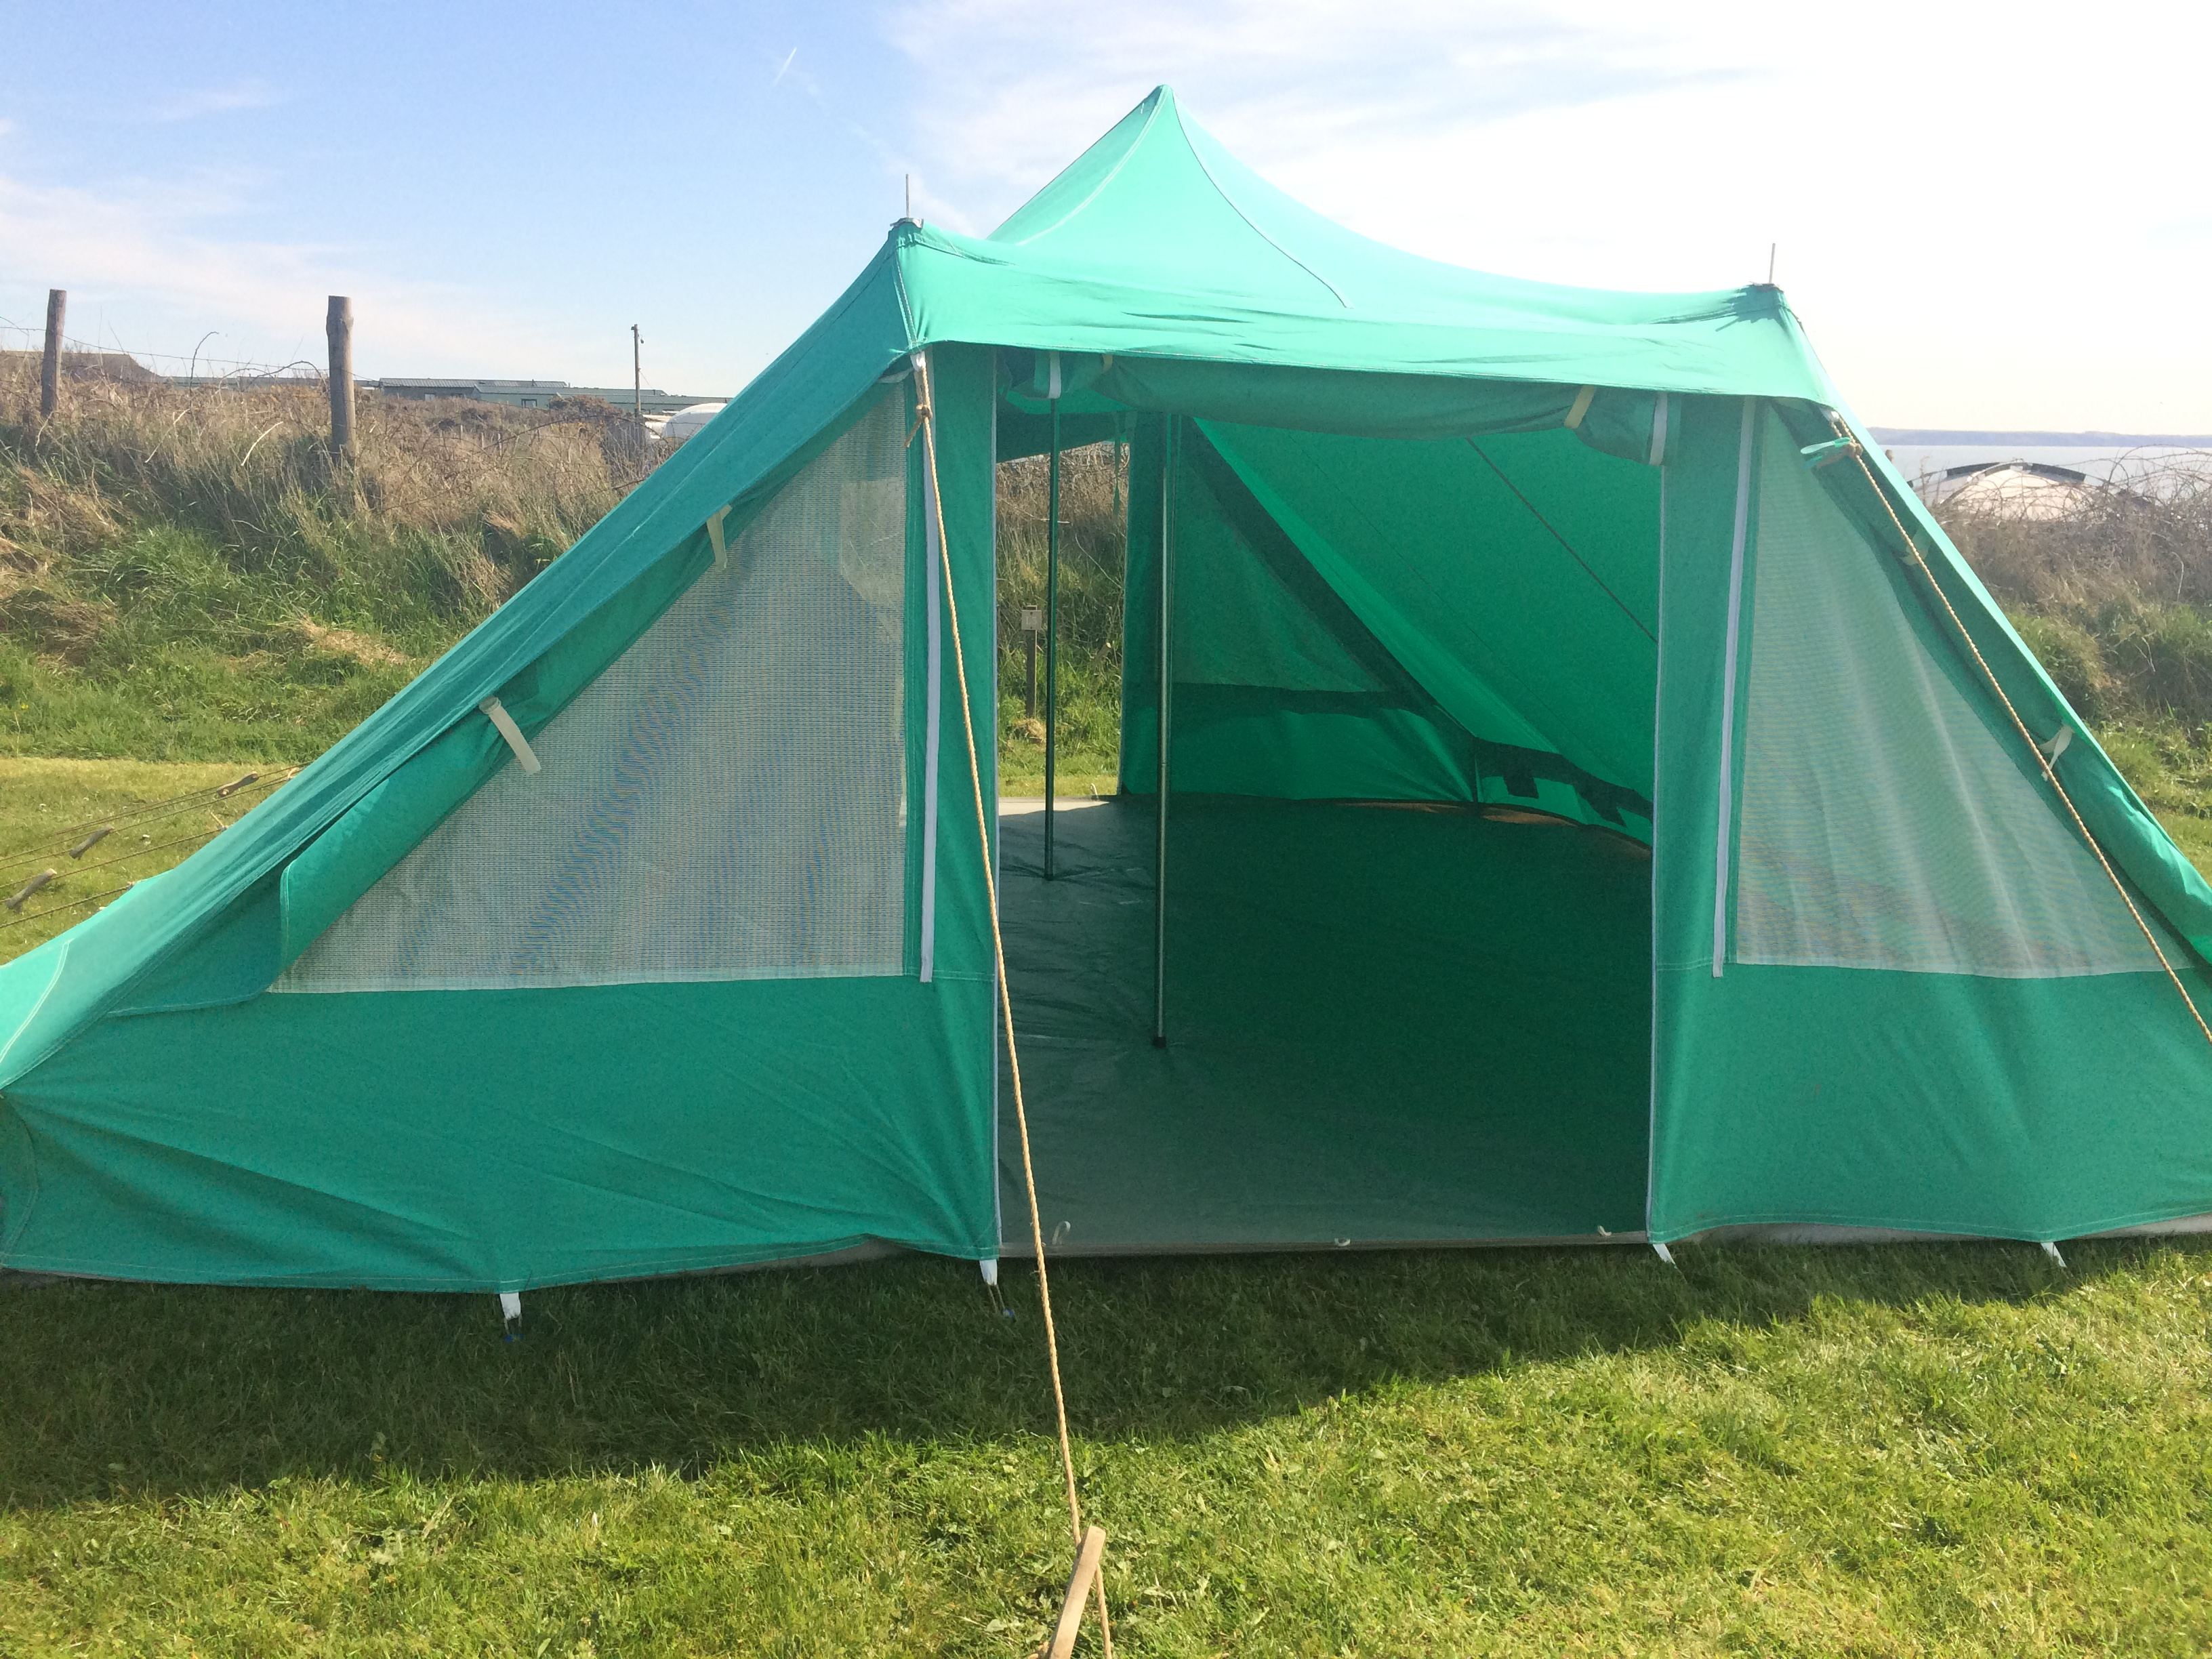 Nepal tent dual entrance light